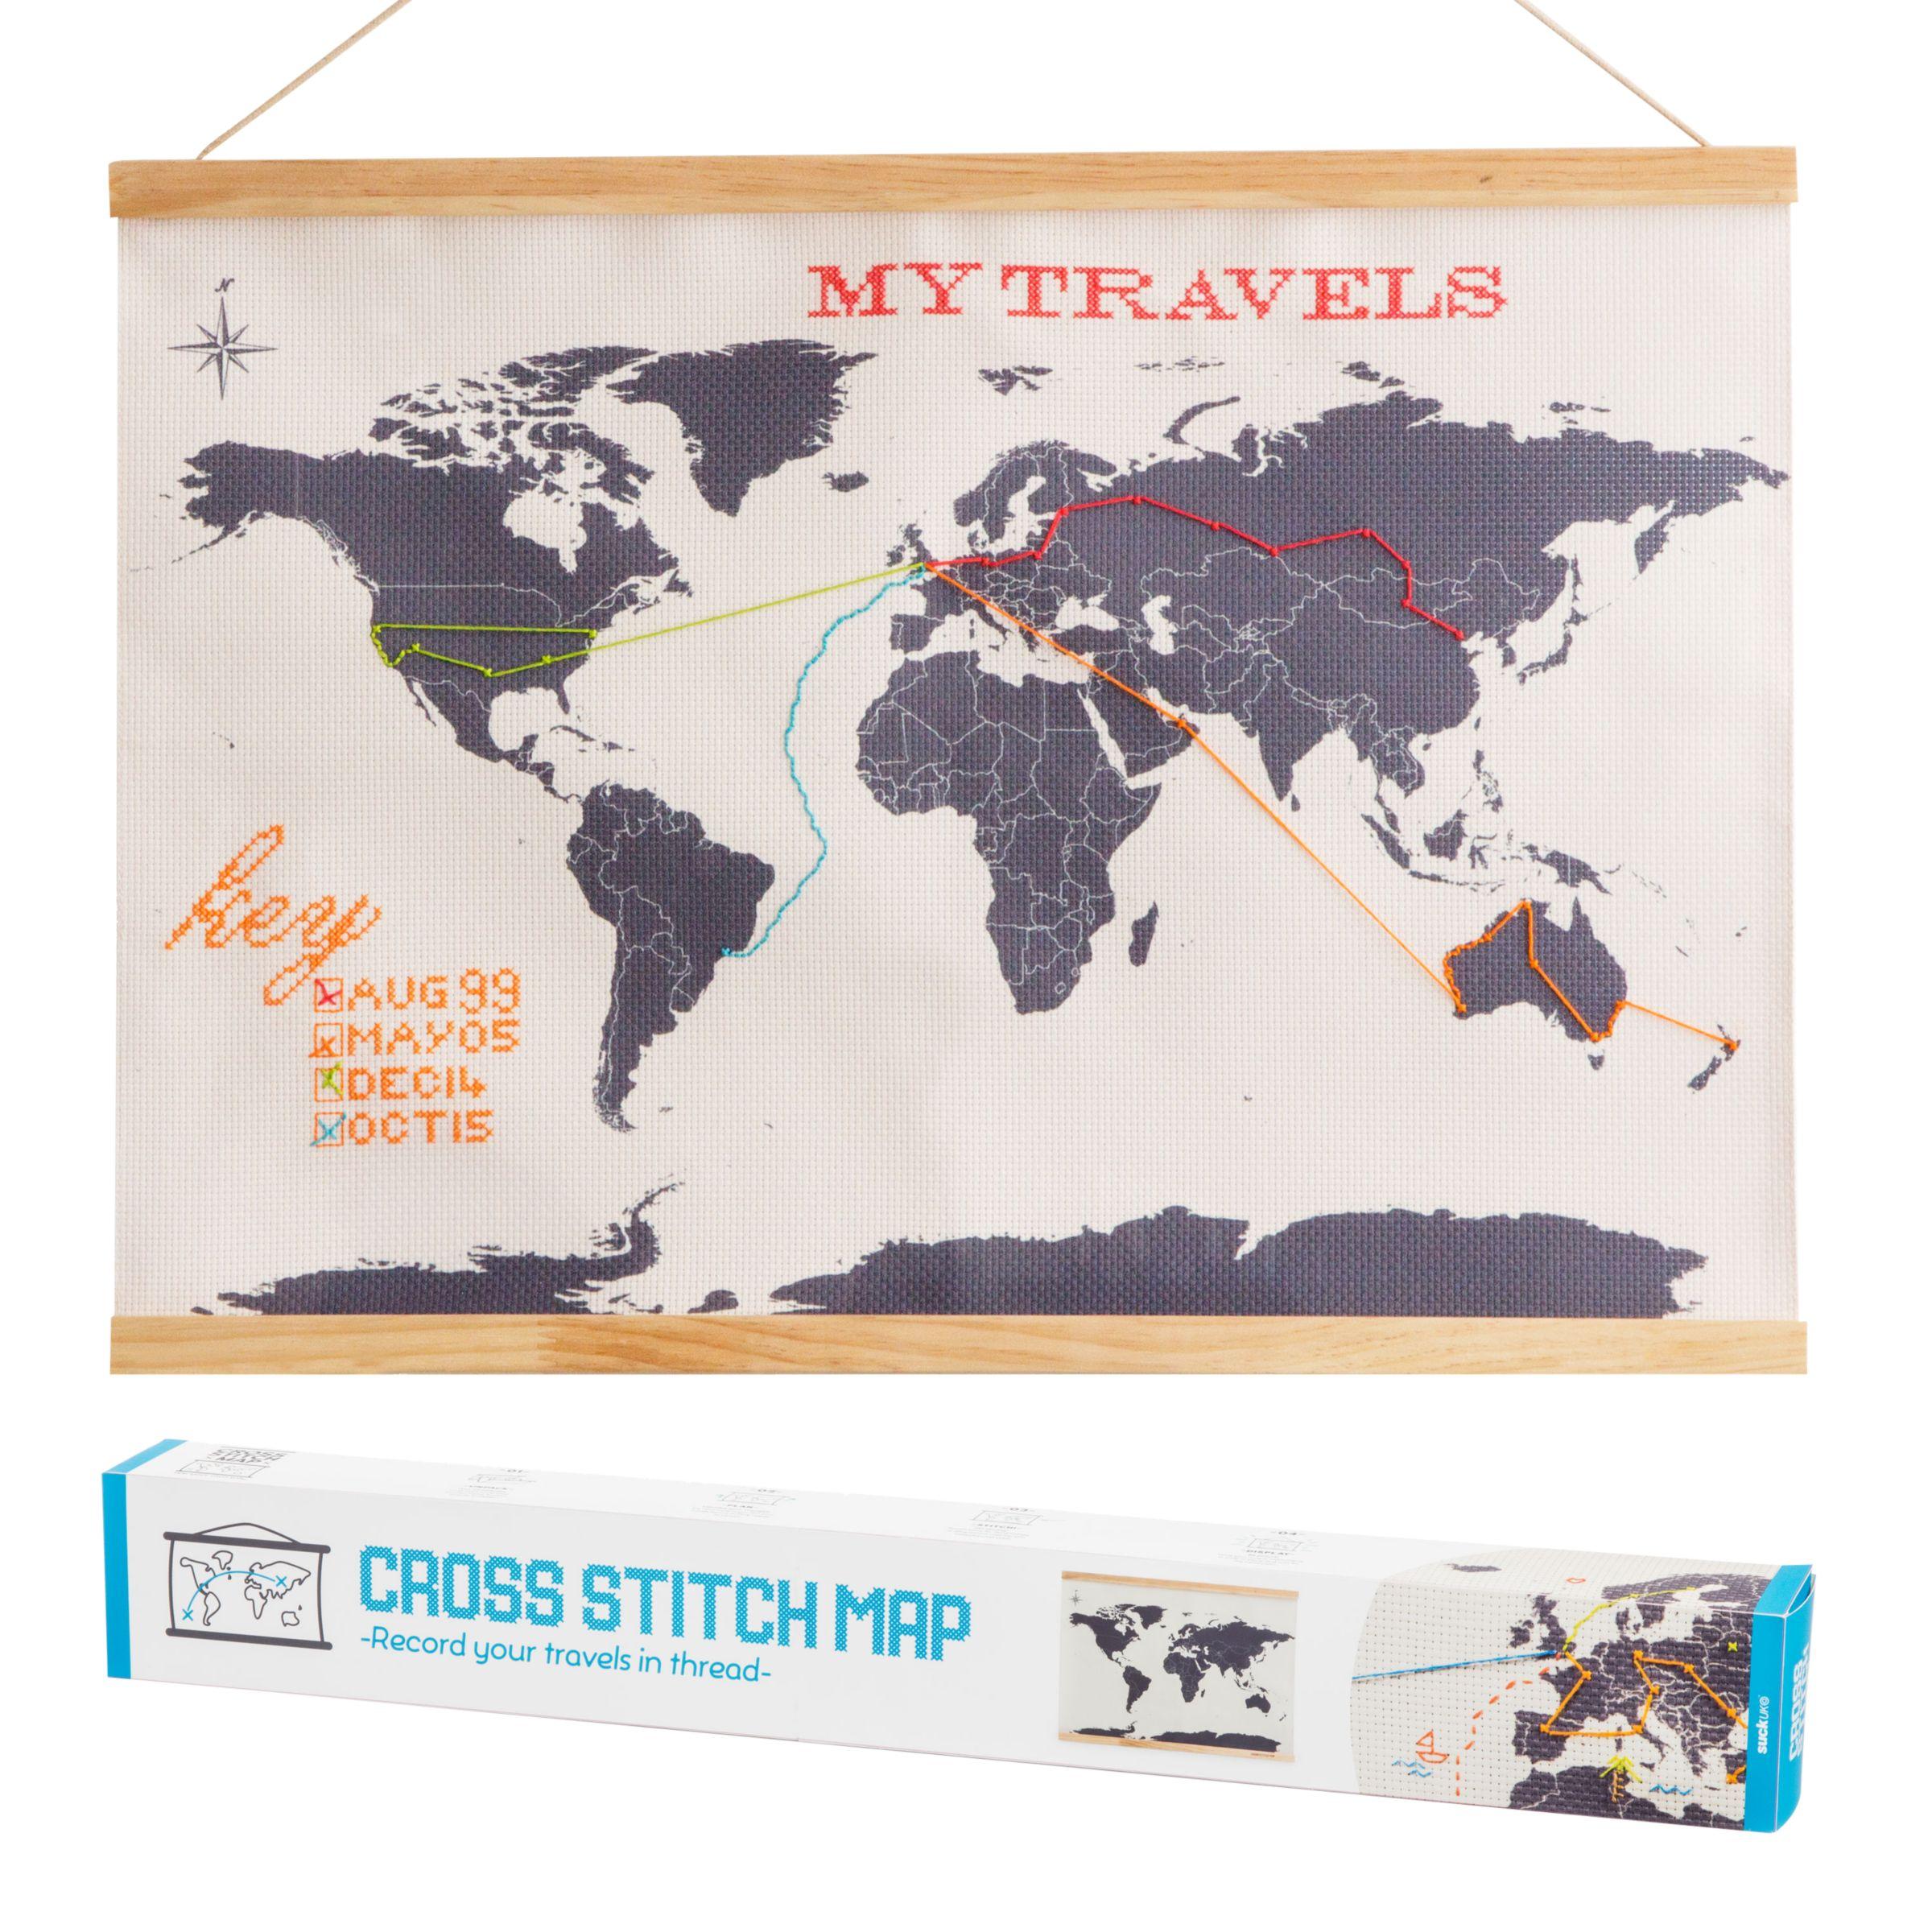 Suck UK Suck UK Cross Stitch Travellers Map